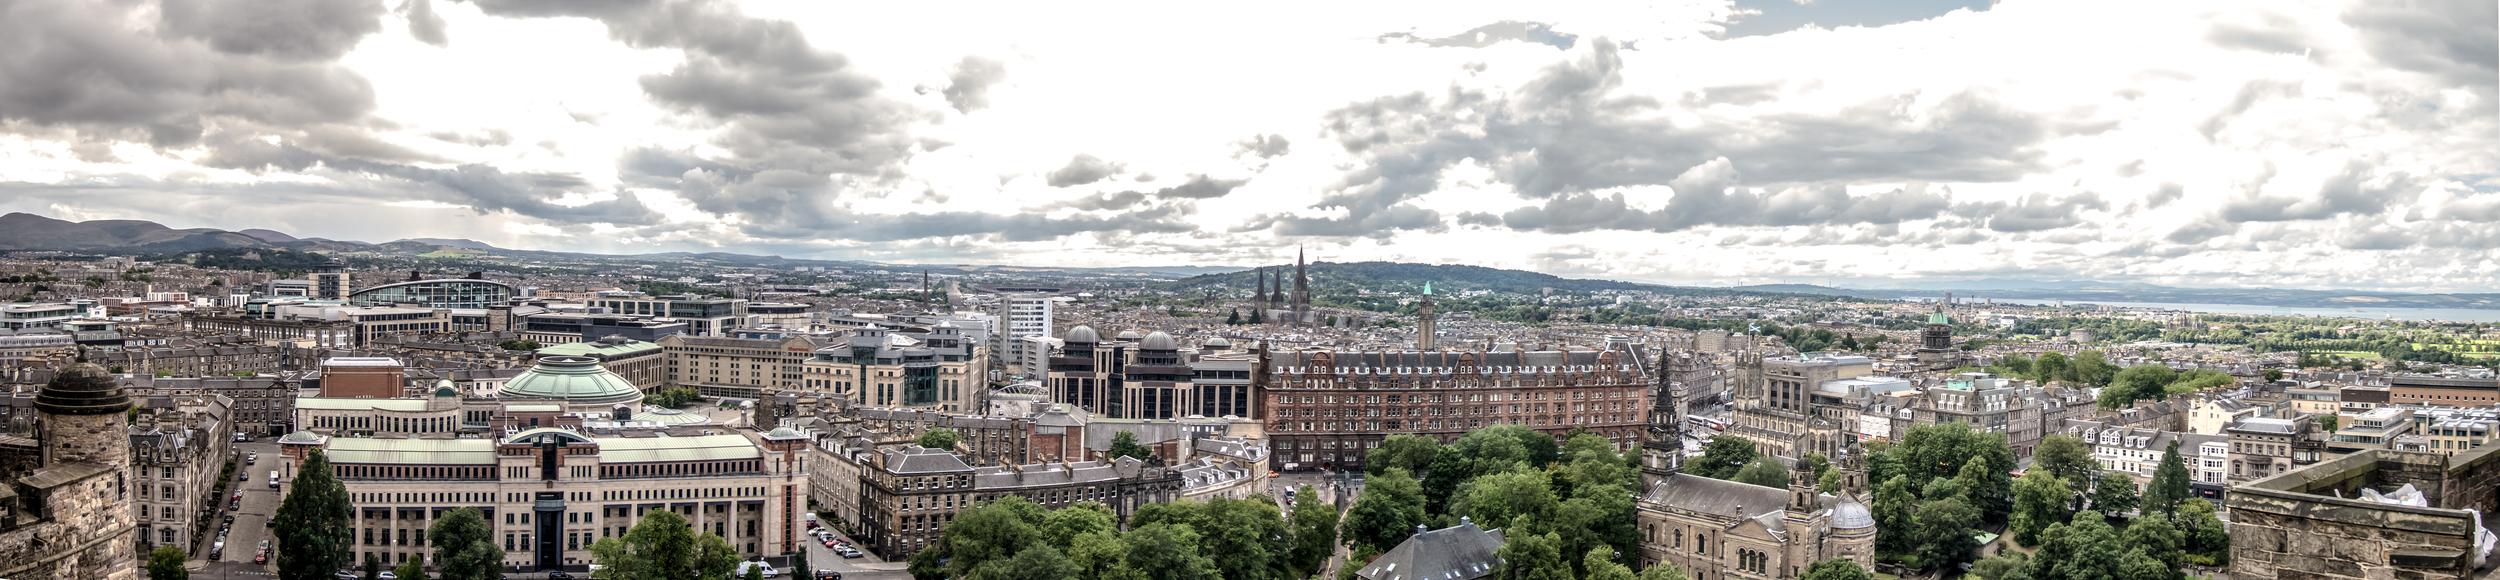 Scotland2015-138.jpg